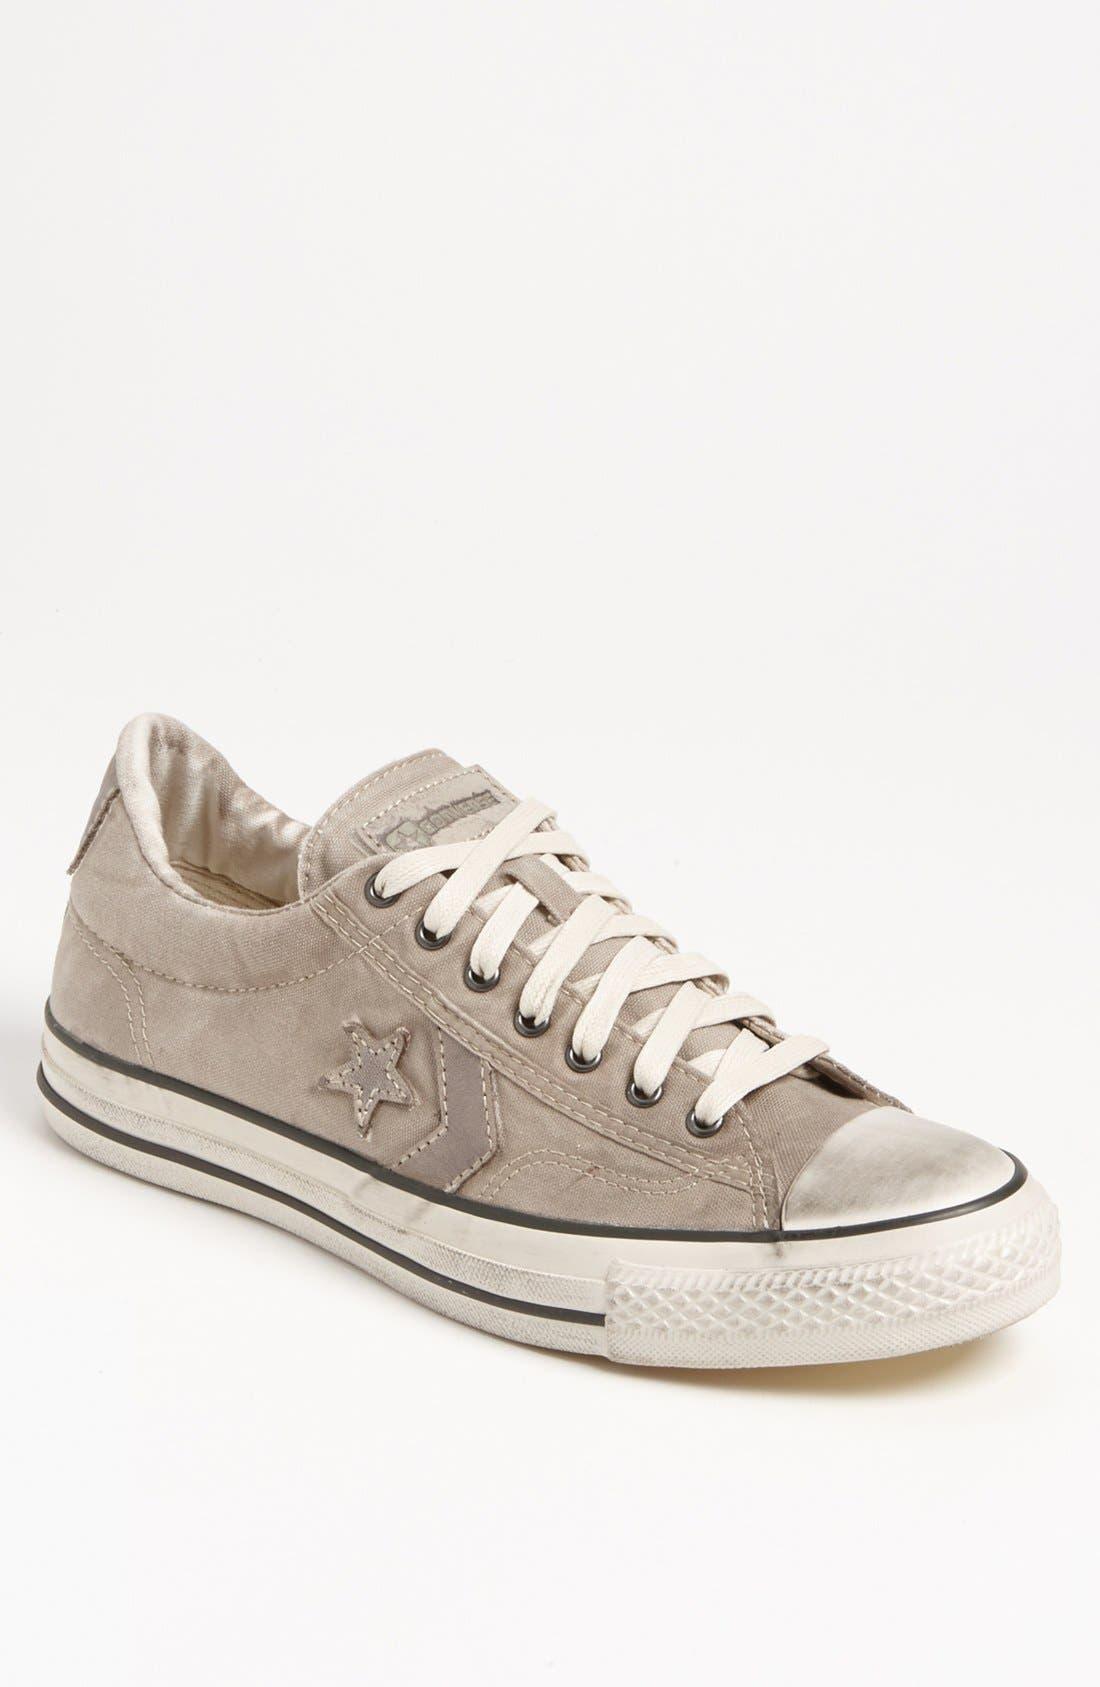 Alternate Image 1 Selected - Converse by John Varvatos 'JV Star Player' Sneaker (Men)